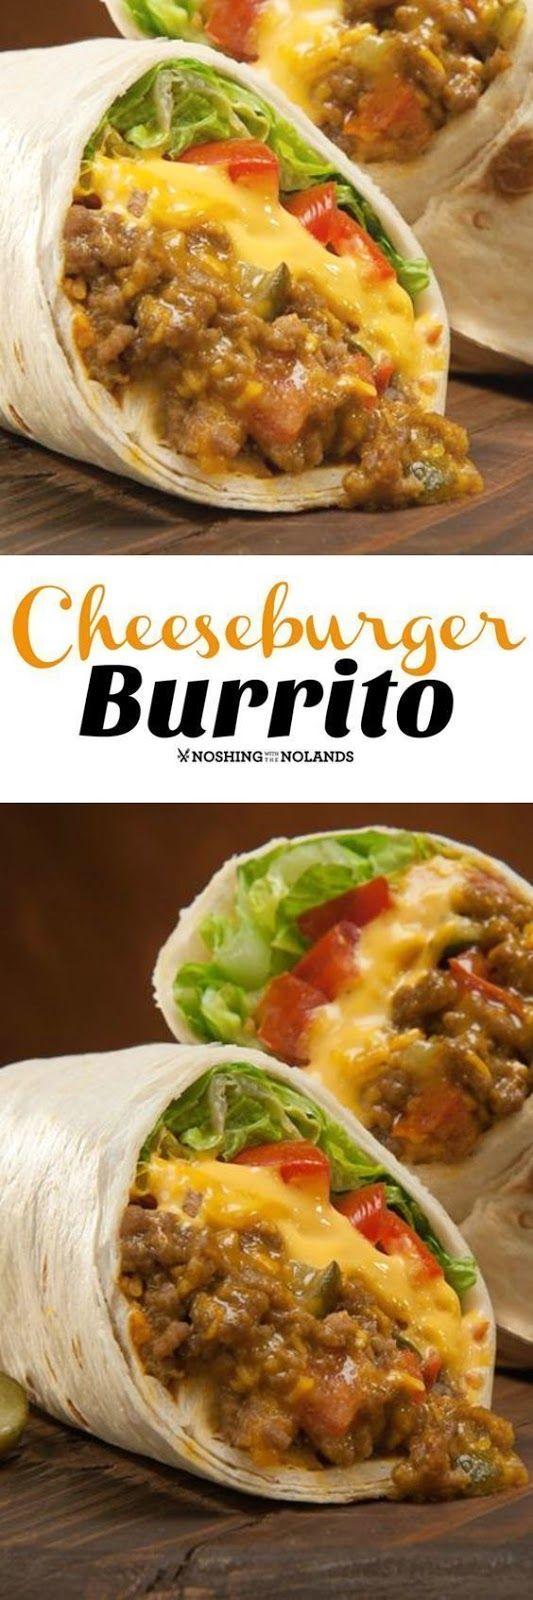 CHEESEBURGER BURRITOS | Food And Cake Recipes (Hamburger Sandwich Recipes)